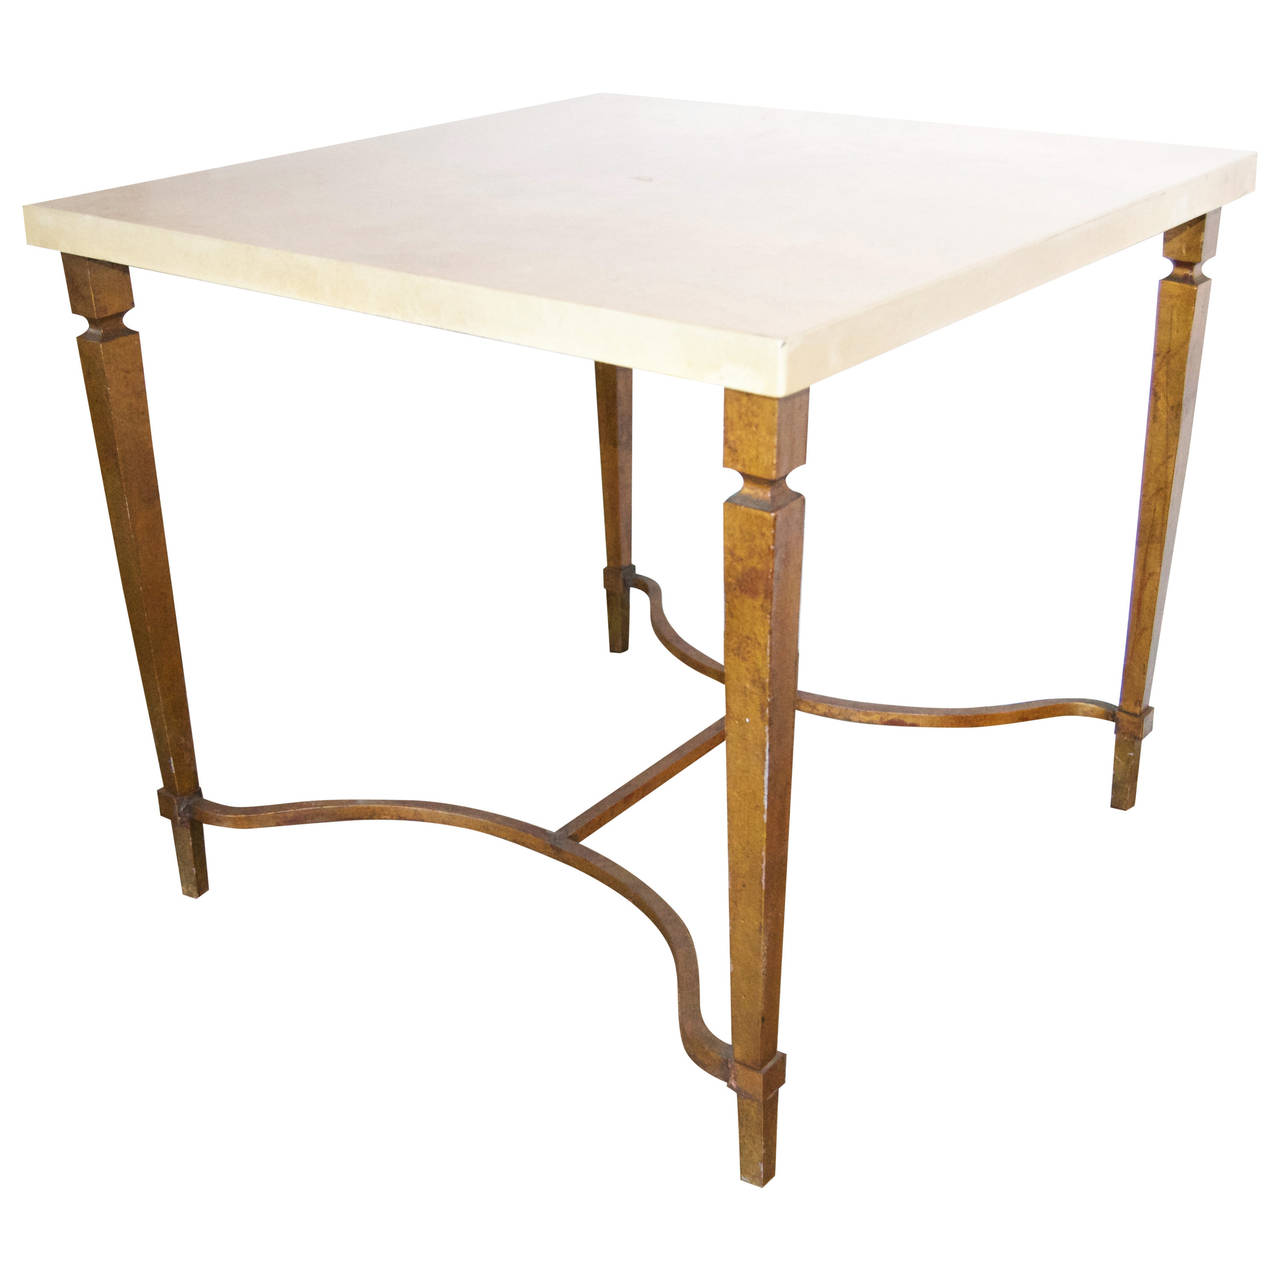 Aldo Tura  Parchment Top Gilded Table $5,500